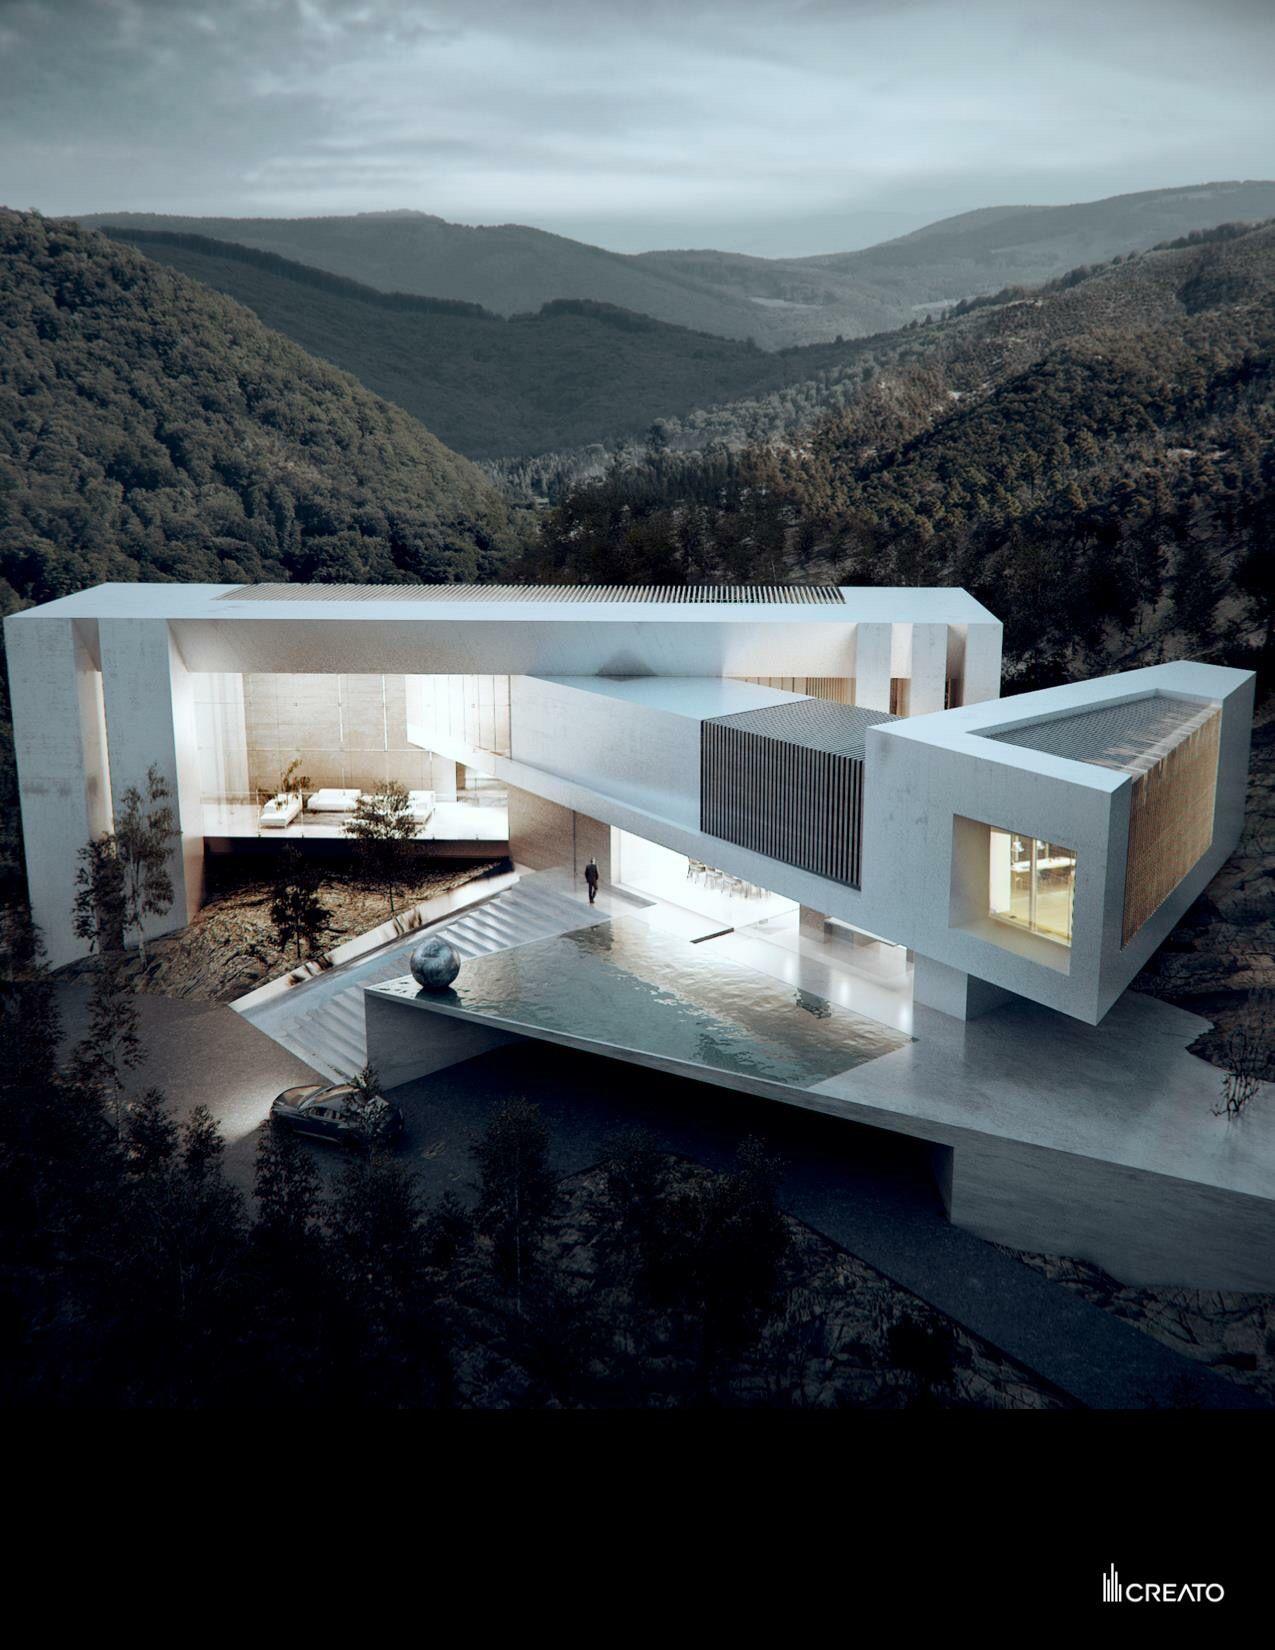 Aqua House | Architecture | Pinterest | Mansions, Aqua and Texas